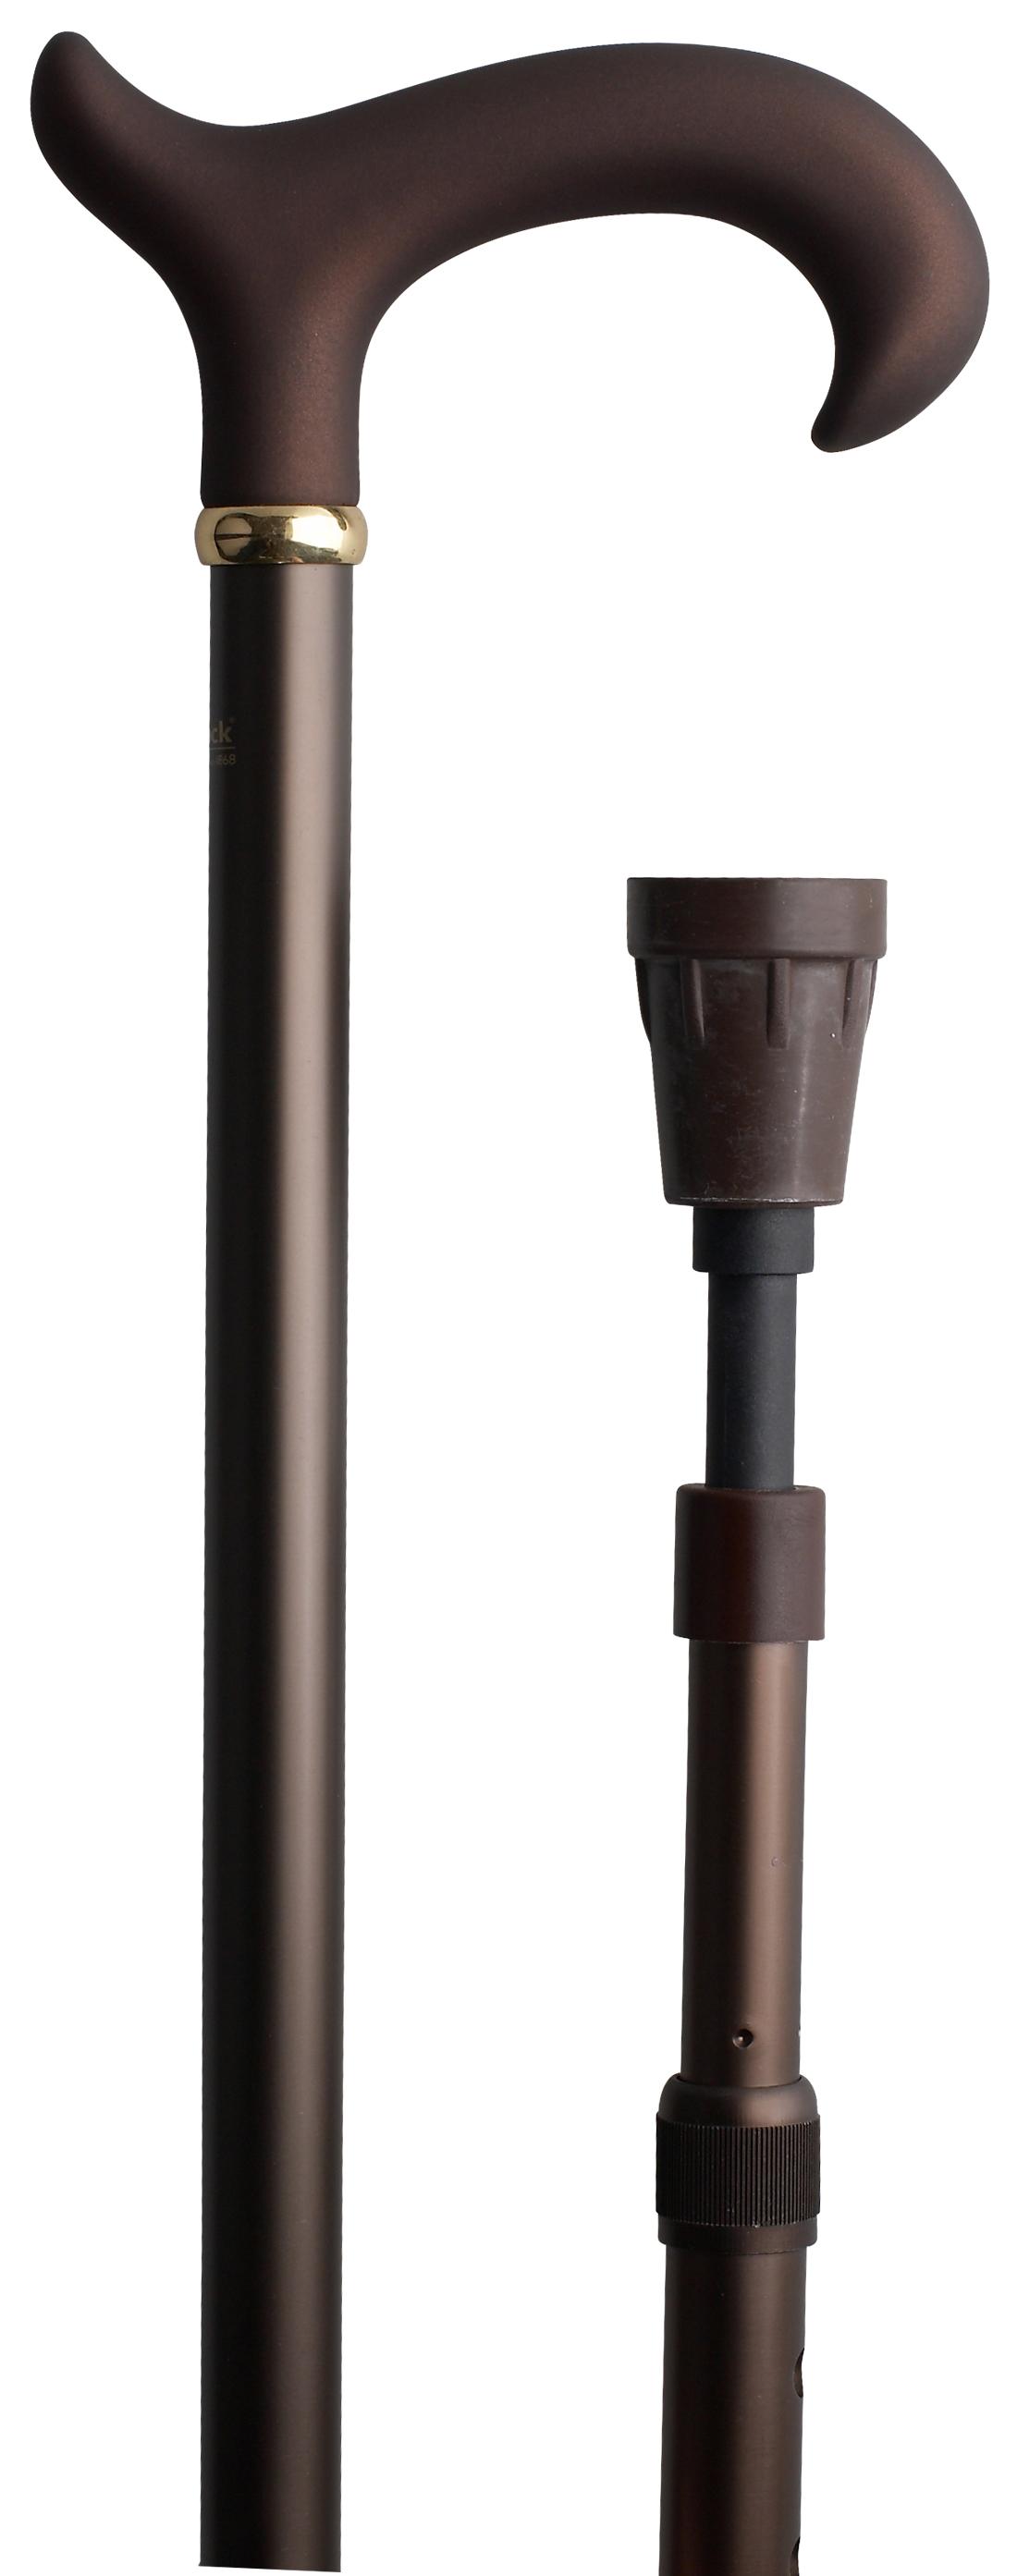 Walking Stick Antishock Ergonomic Derby Handle Made Of